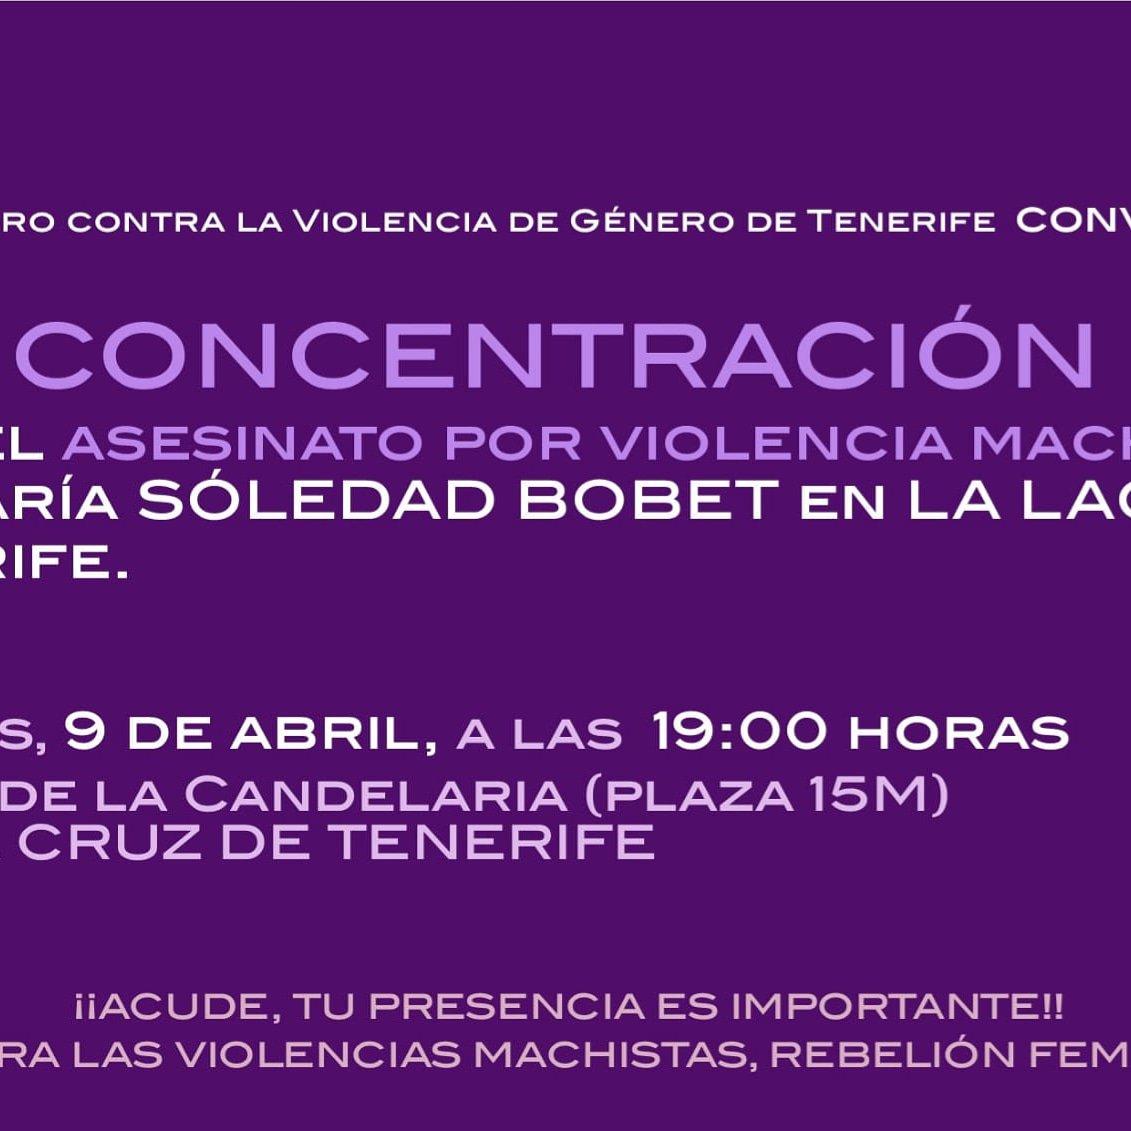 Basta Ya! #VivasNosQueremos https://t.co/vQFiJdp1vl